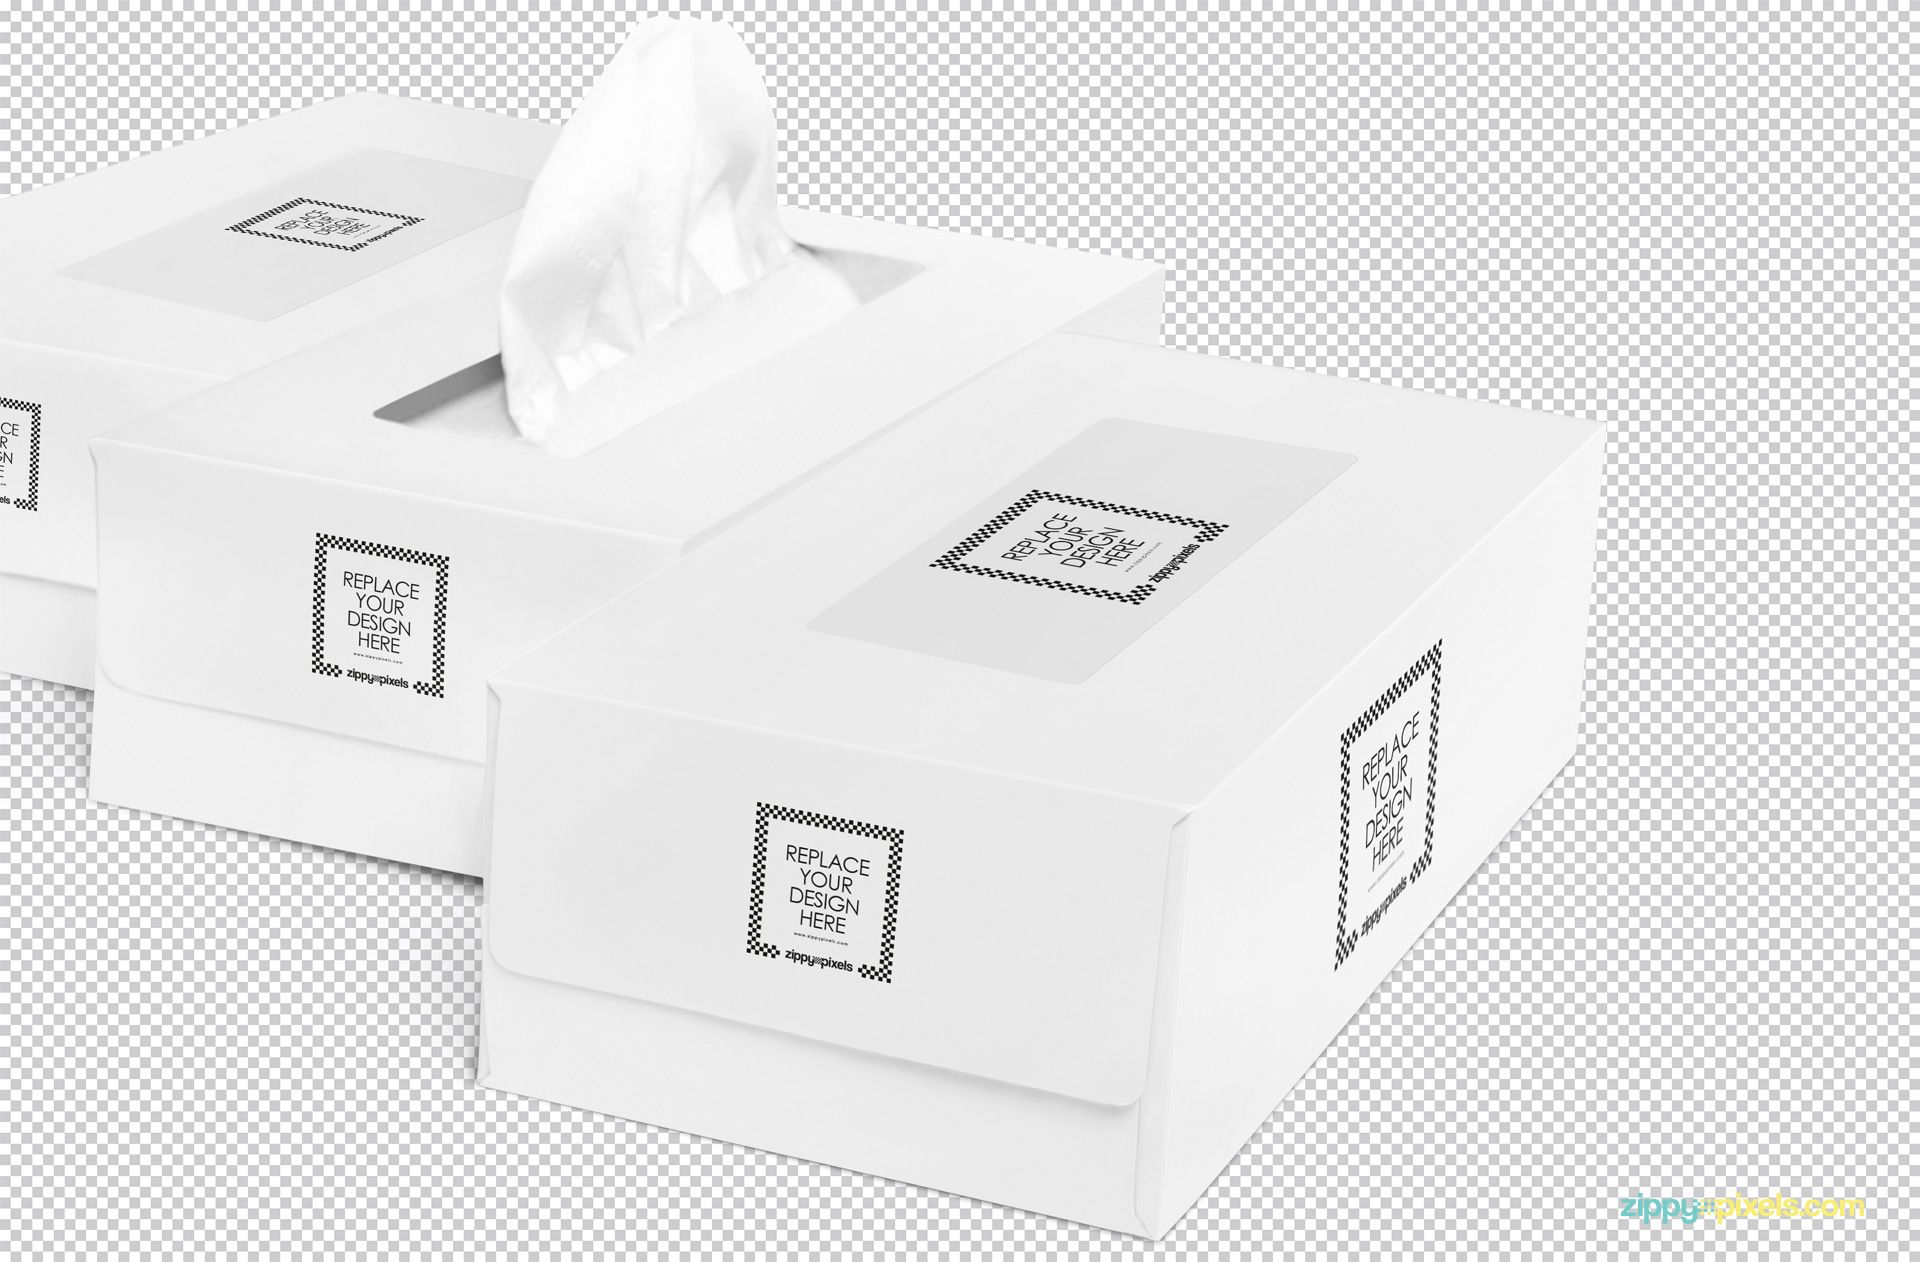 Download Free Luxury Tissue Box Mockup Zippypixels Box Mockup Mockup Free Download Free Mockup